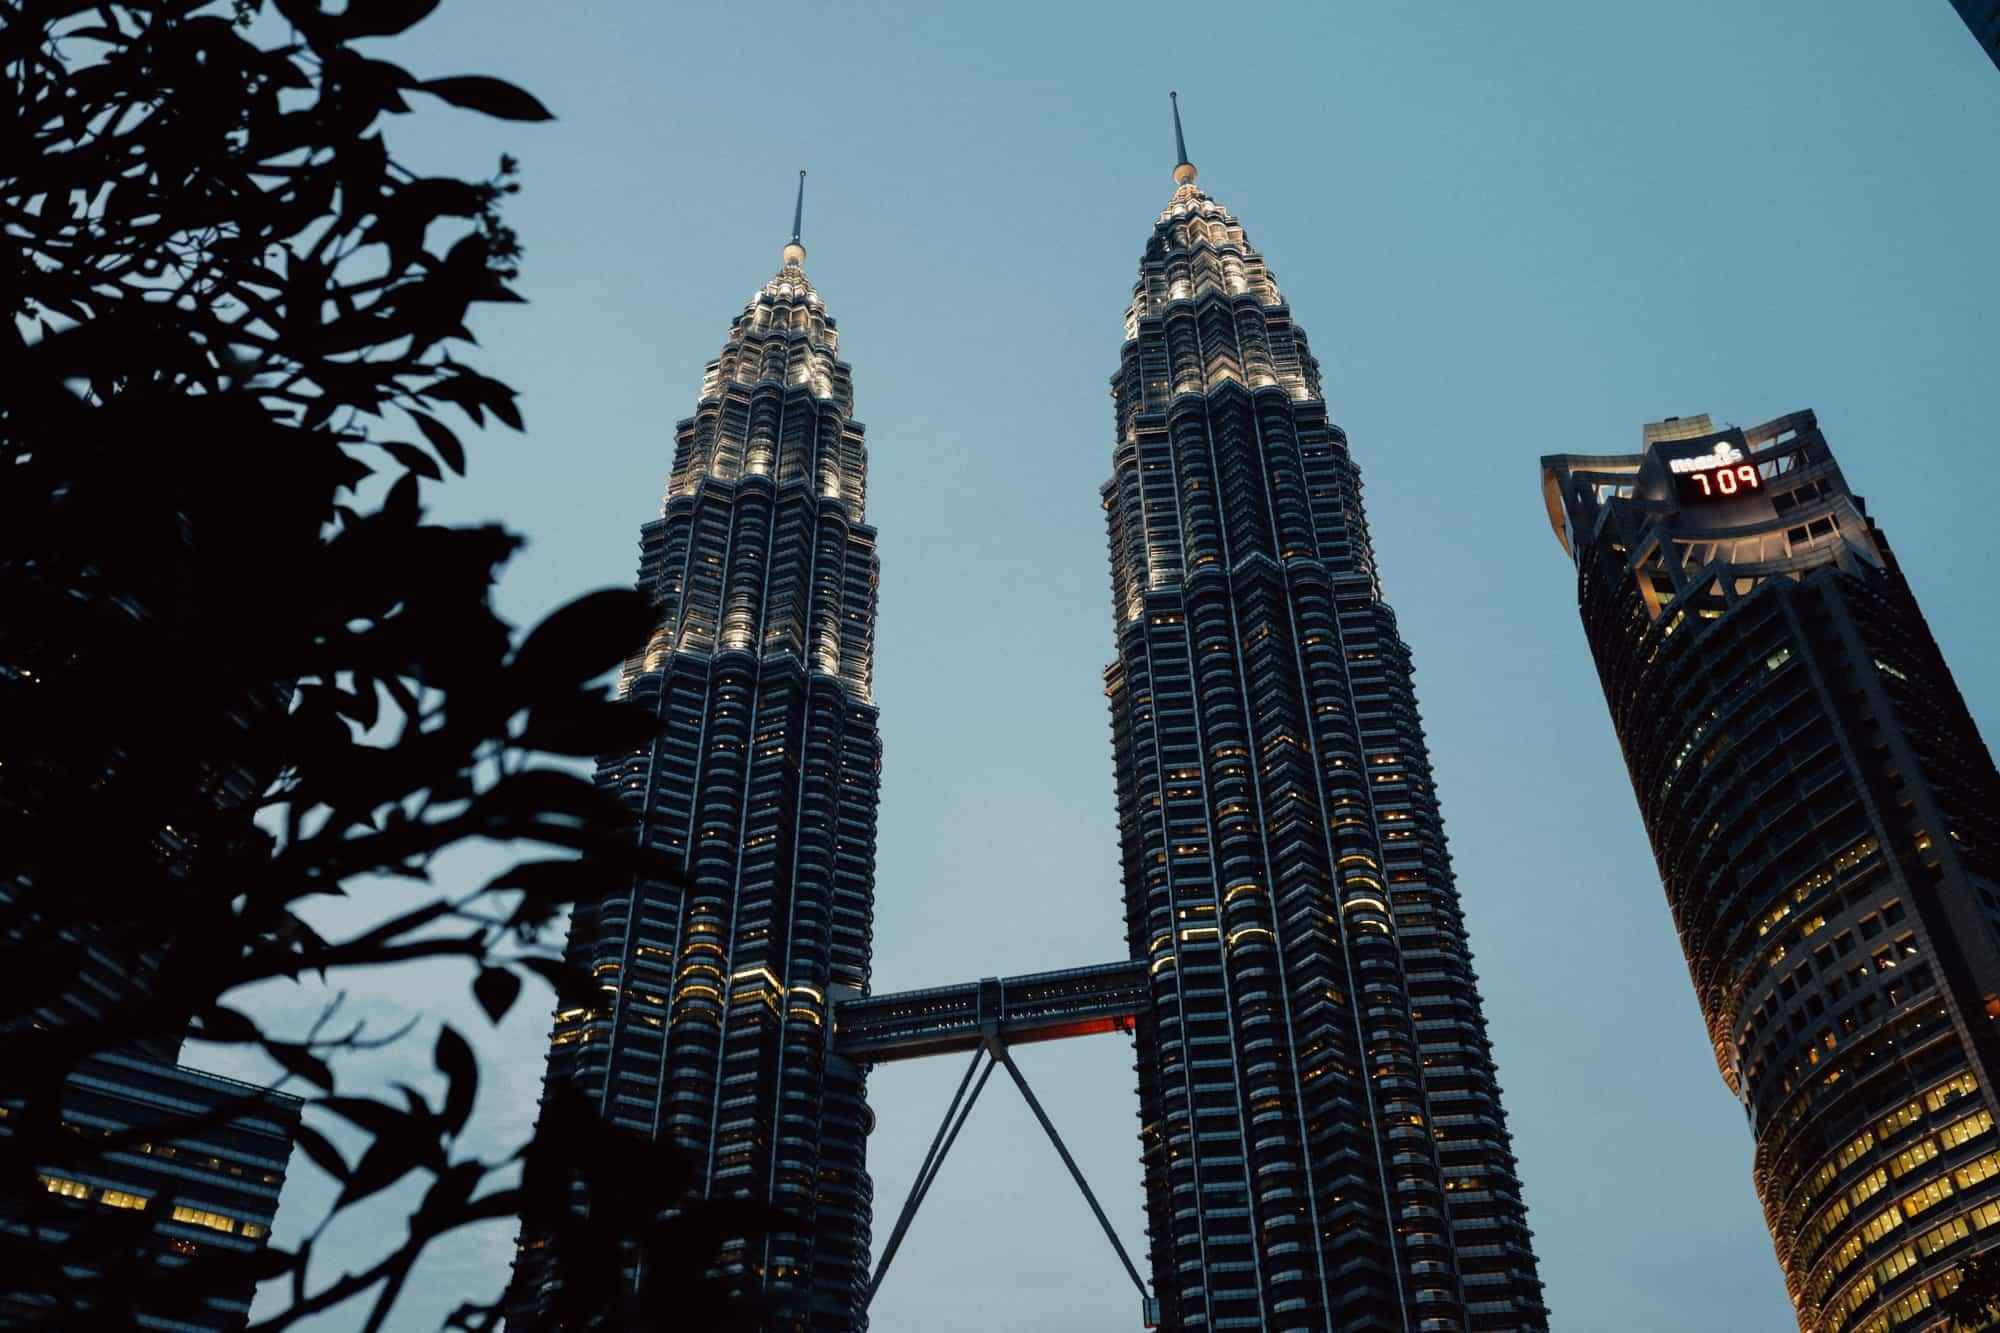 Sylt Fototgraf Sylt Heiraten auf Sylt Hochzeitsfotograf Sylt Malaysia Reisen Kuala Lumpur